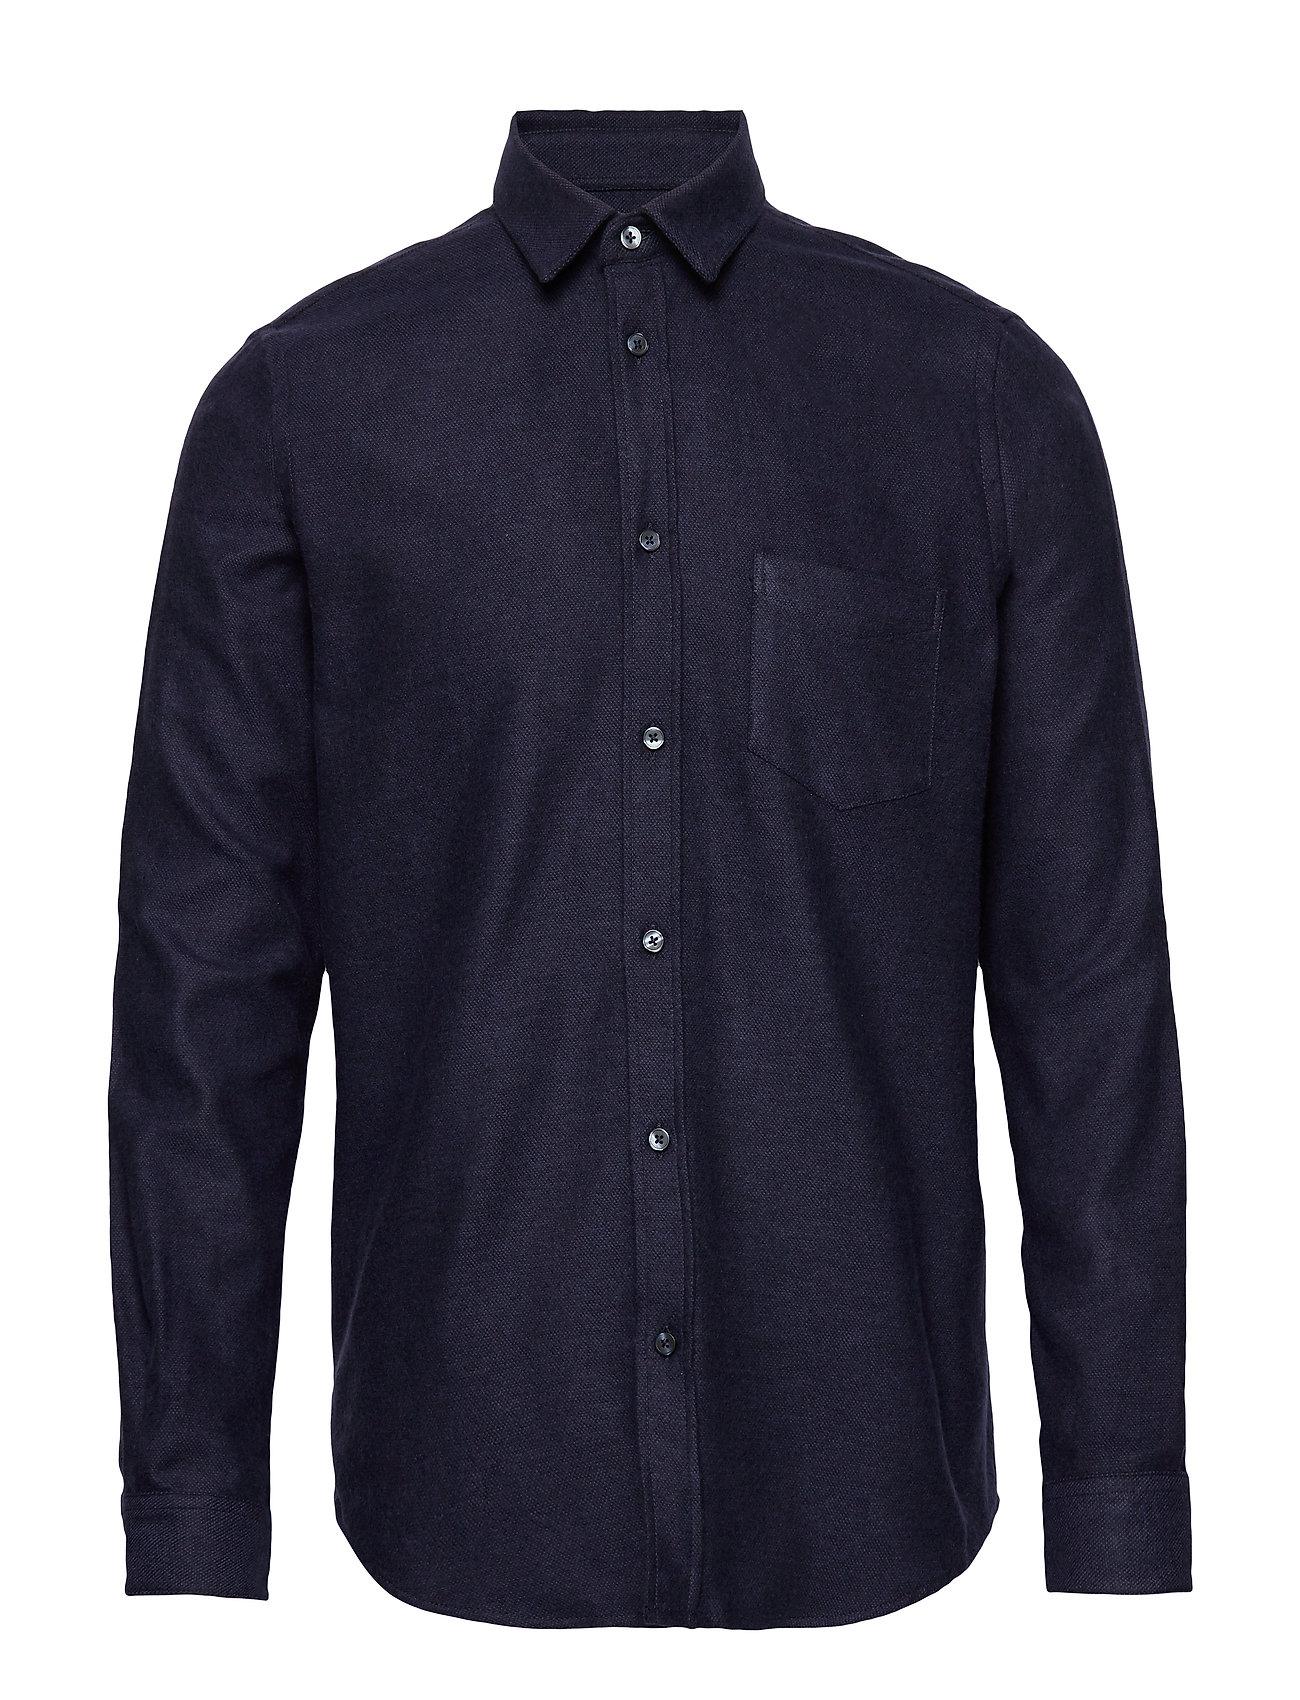 Samsøe & Samsøe Liam NA shirt 7383 - NIGHT SKY MEL.